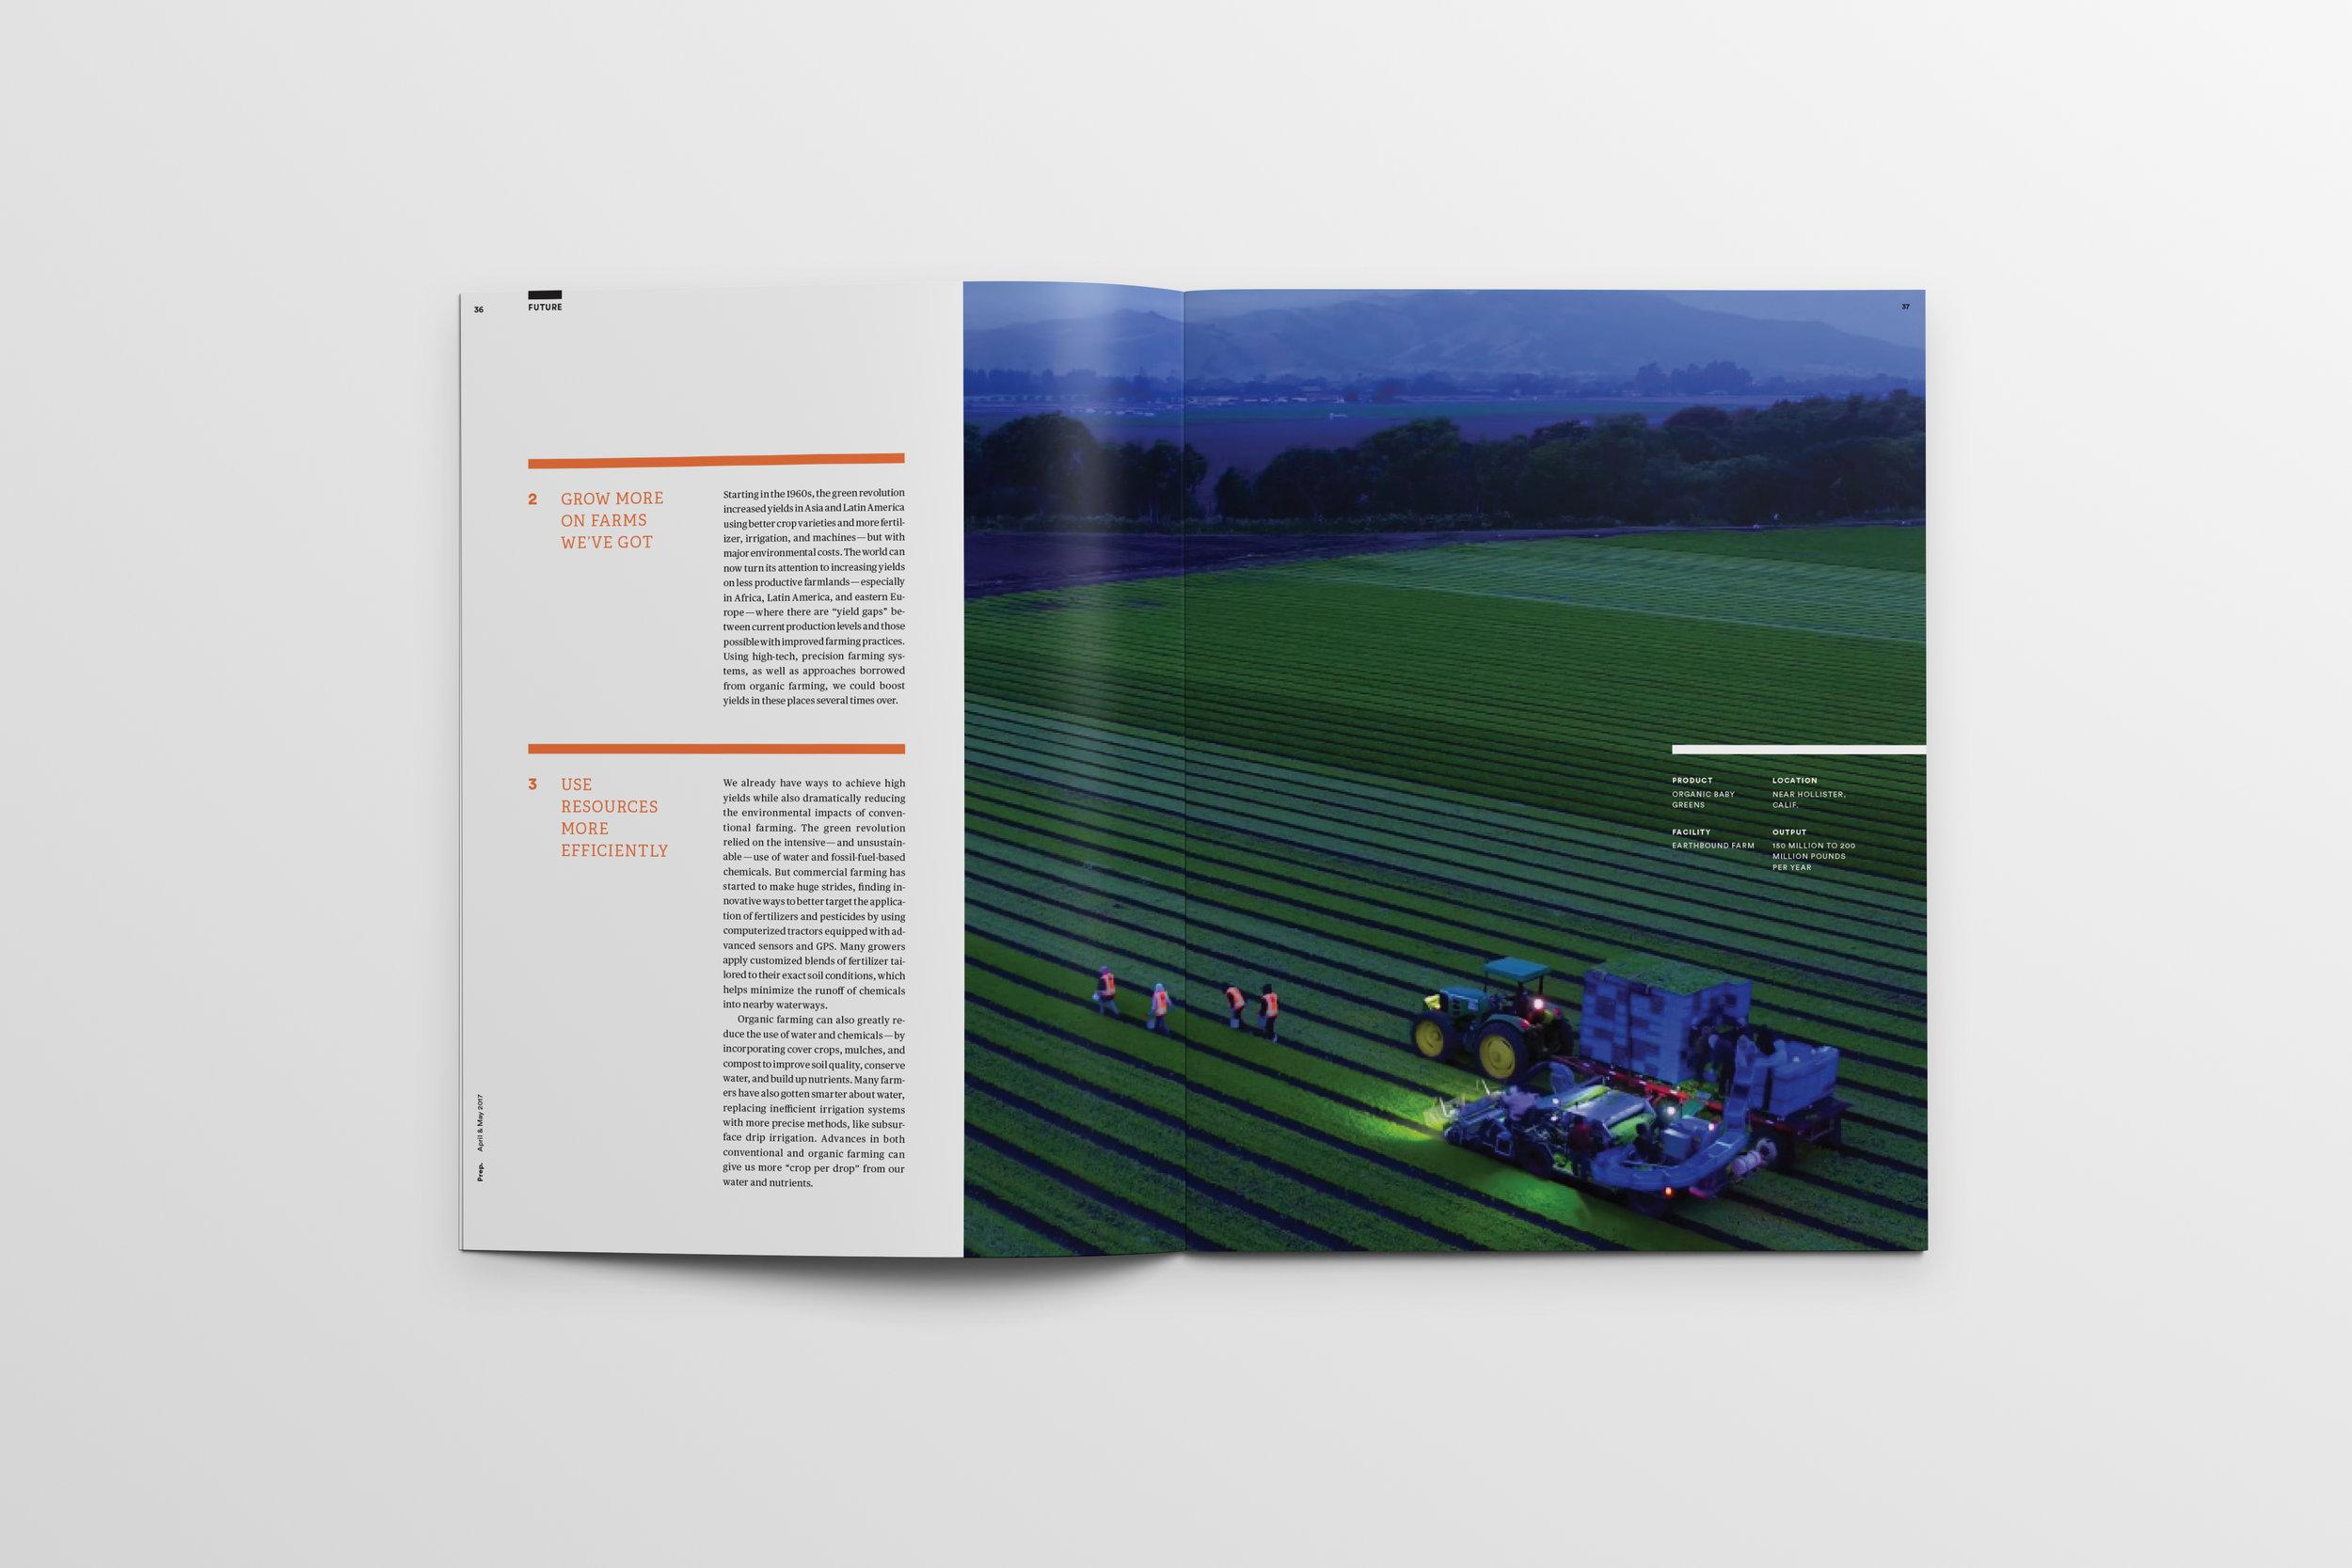 Magazine_Mockup_Pages35-36.jpg